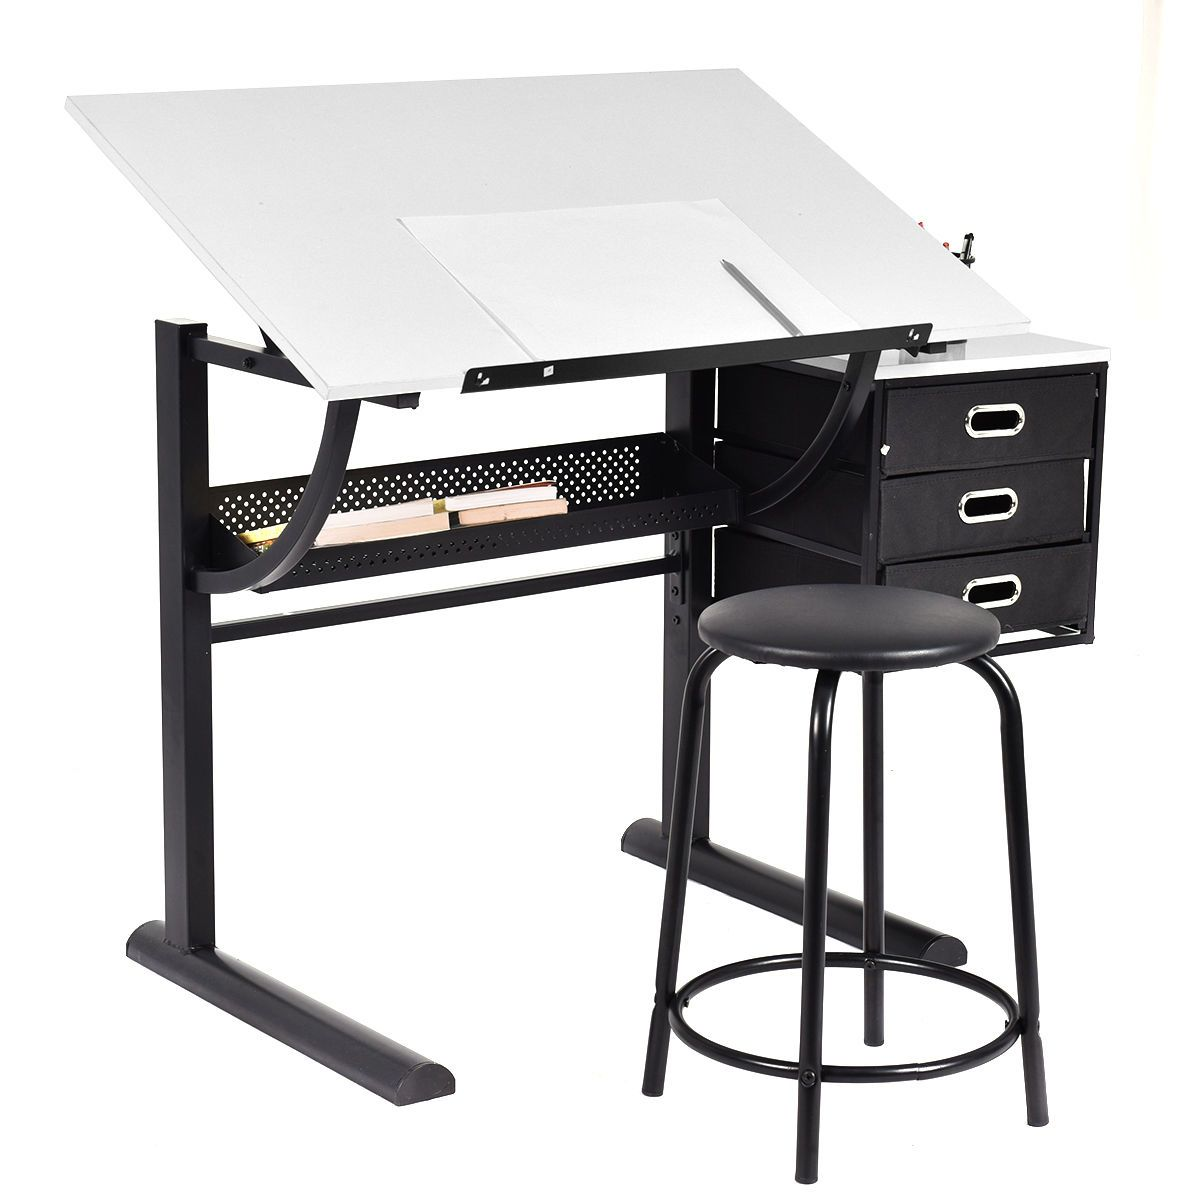 Exceptional Drafting Table Art U0026 Craft Drawing Desk Art Hobby Folding Adjustable W/  Stool